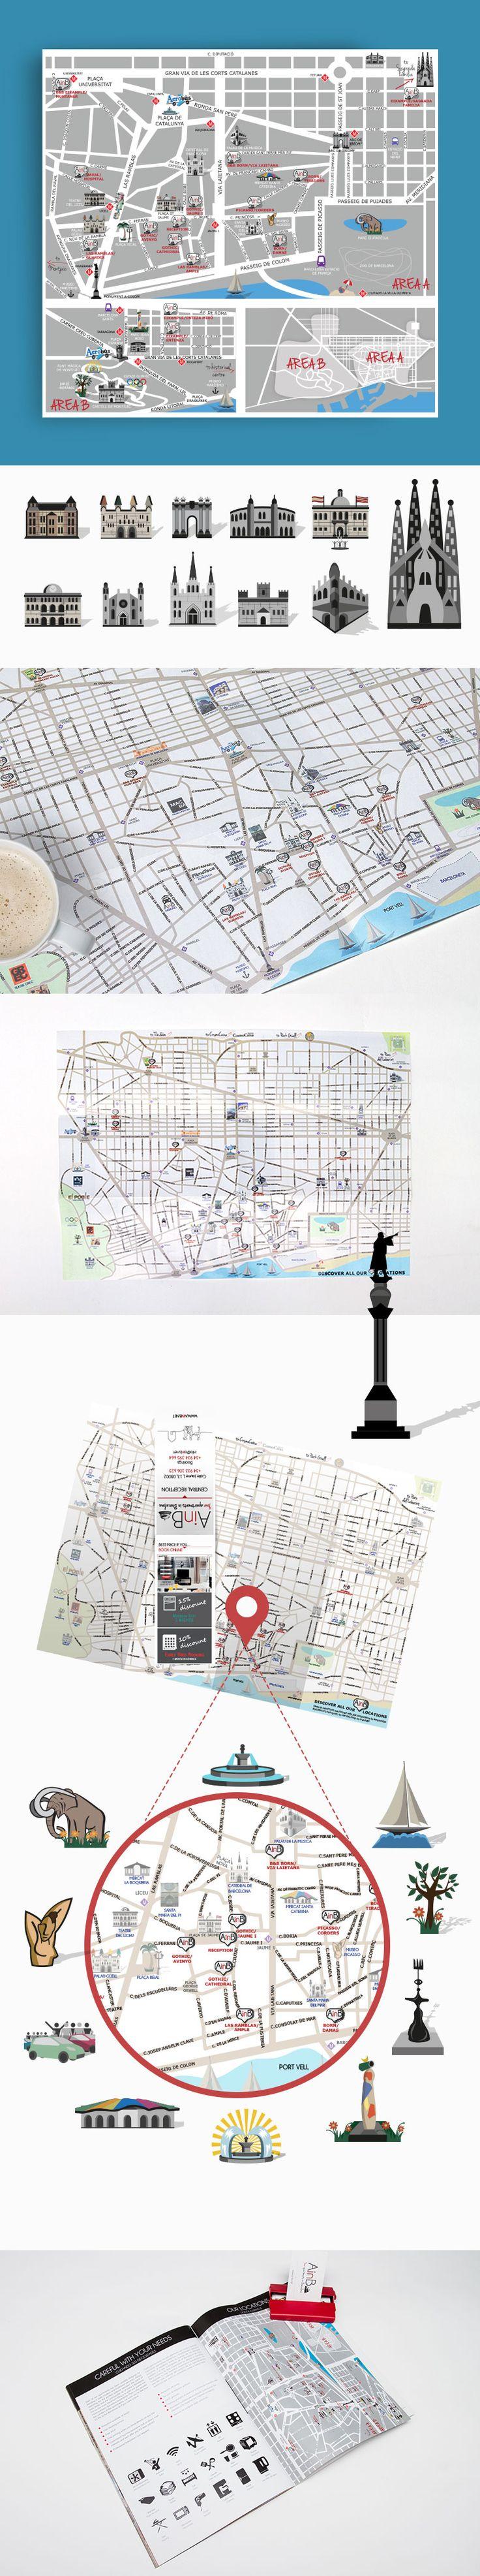 Barcelona Maps for AinB.net Agency — UnfoldAtelier: Boost Sales with Friendly Design